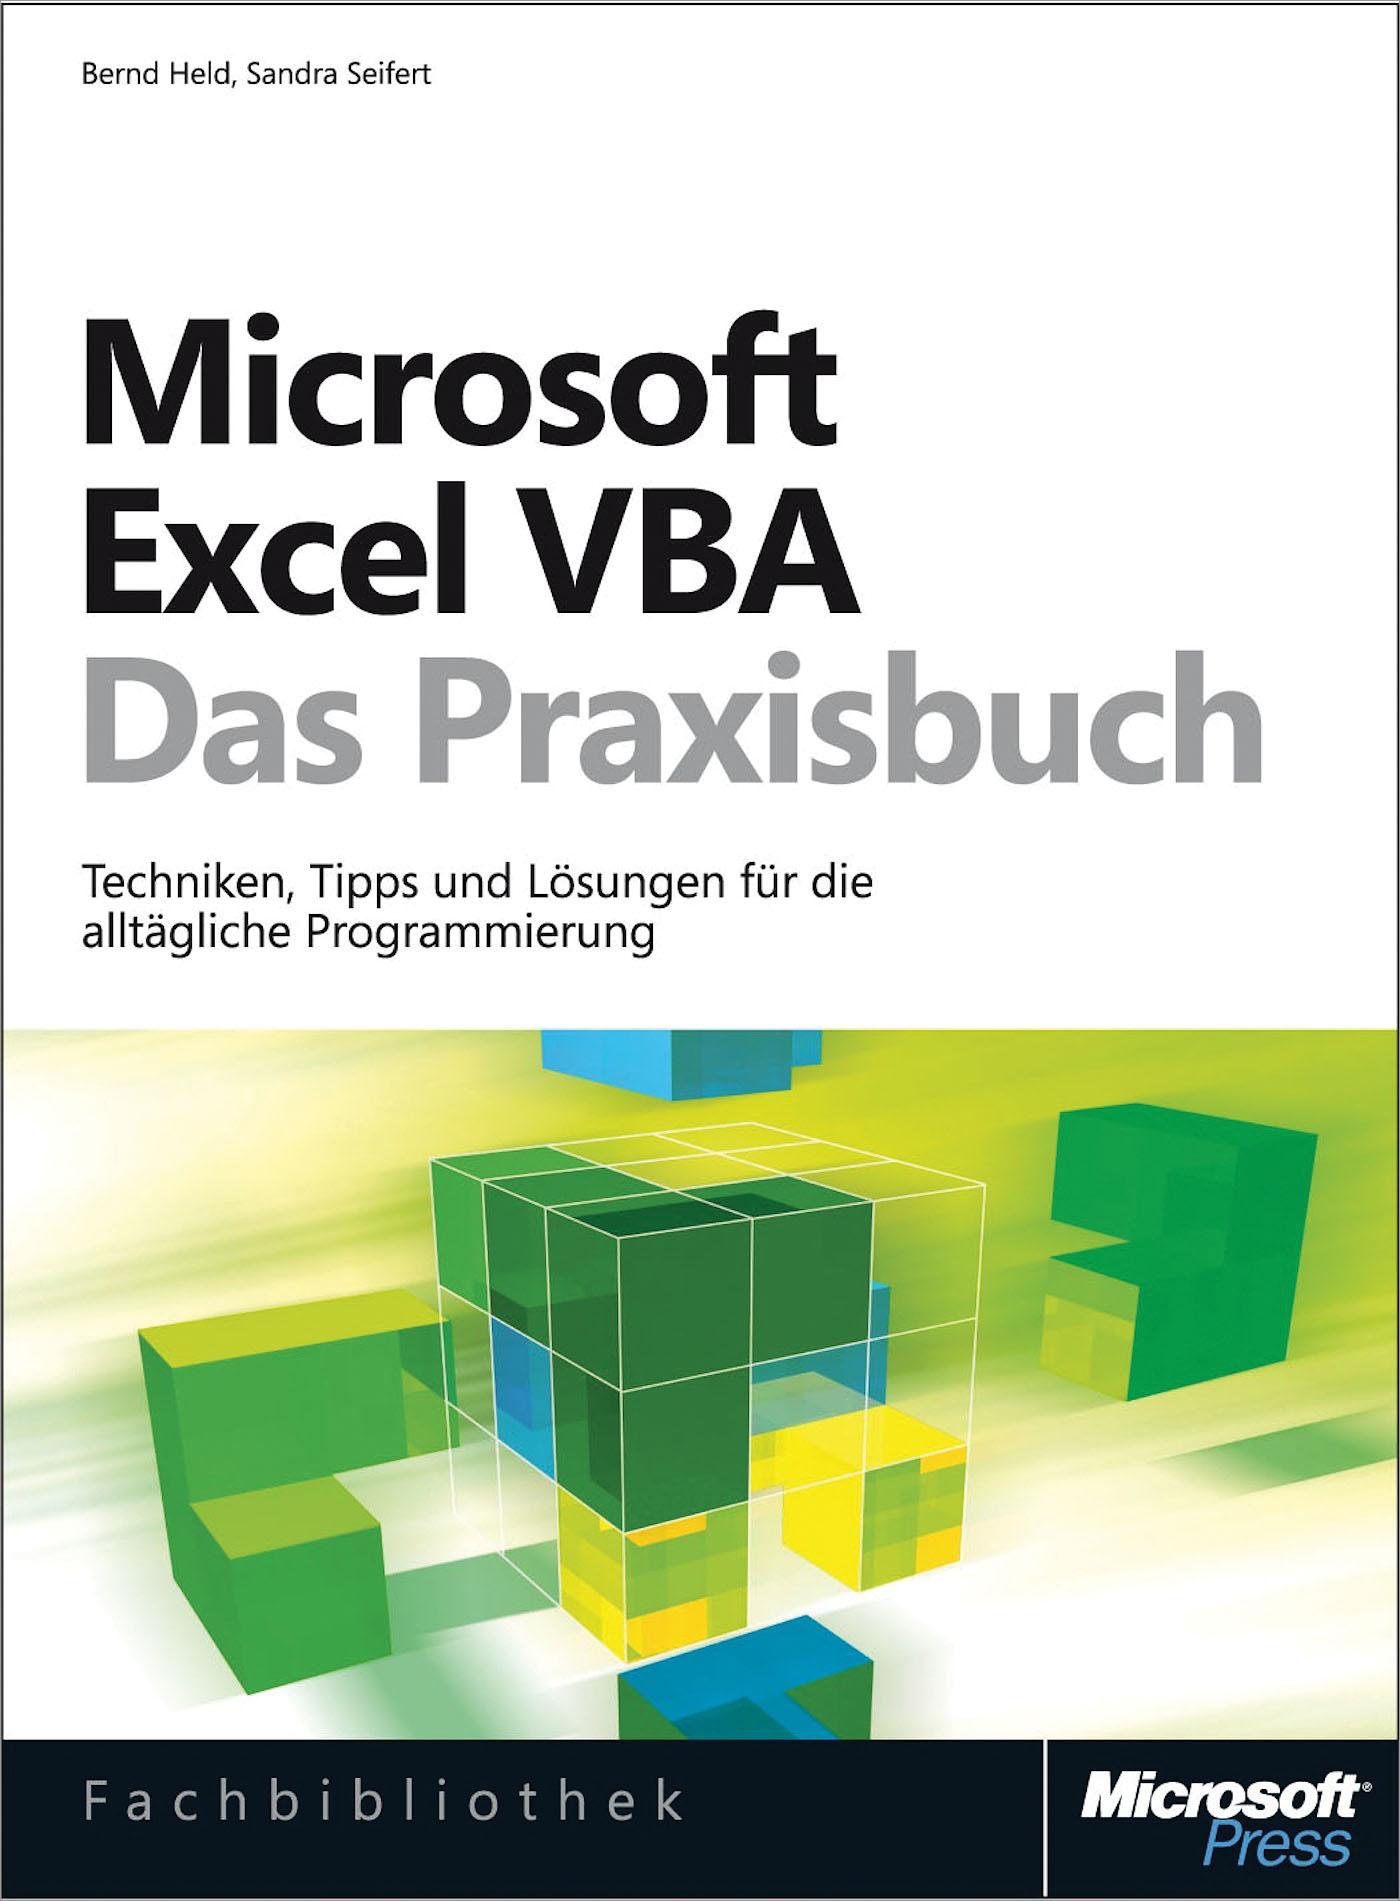 Bernd Held Microsoft Excel VBA - Das Praxisbuch. Für Microsoft Excel 2007-2013. michael alexander excel 2016 power programming with vba